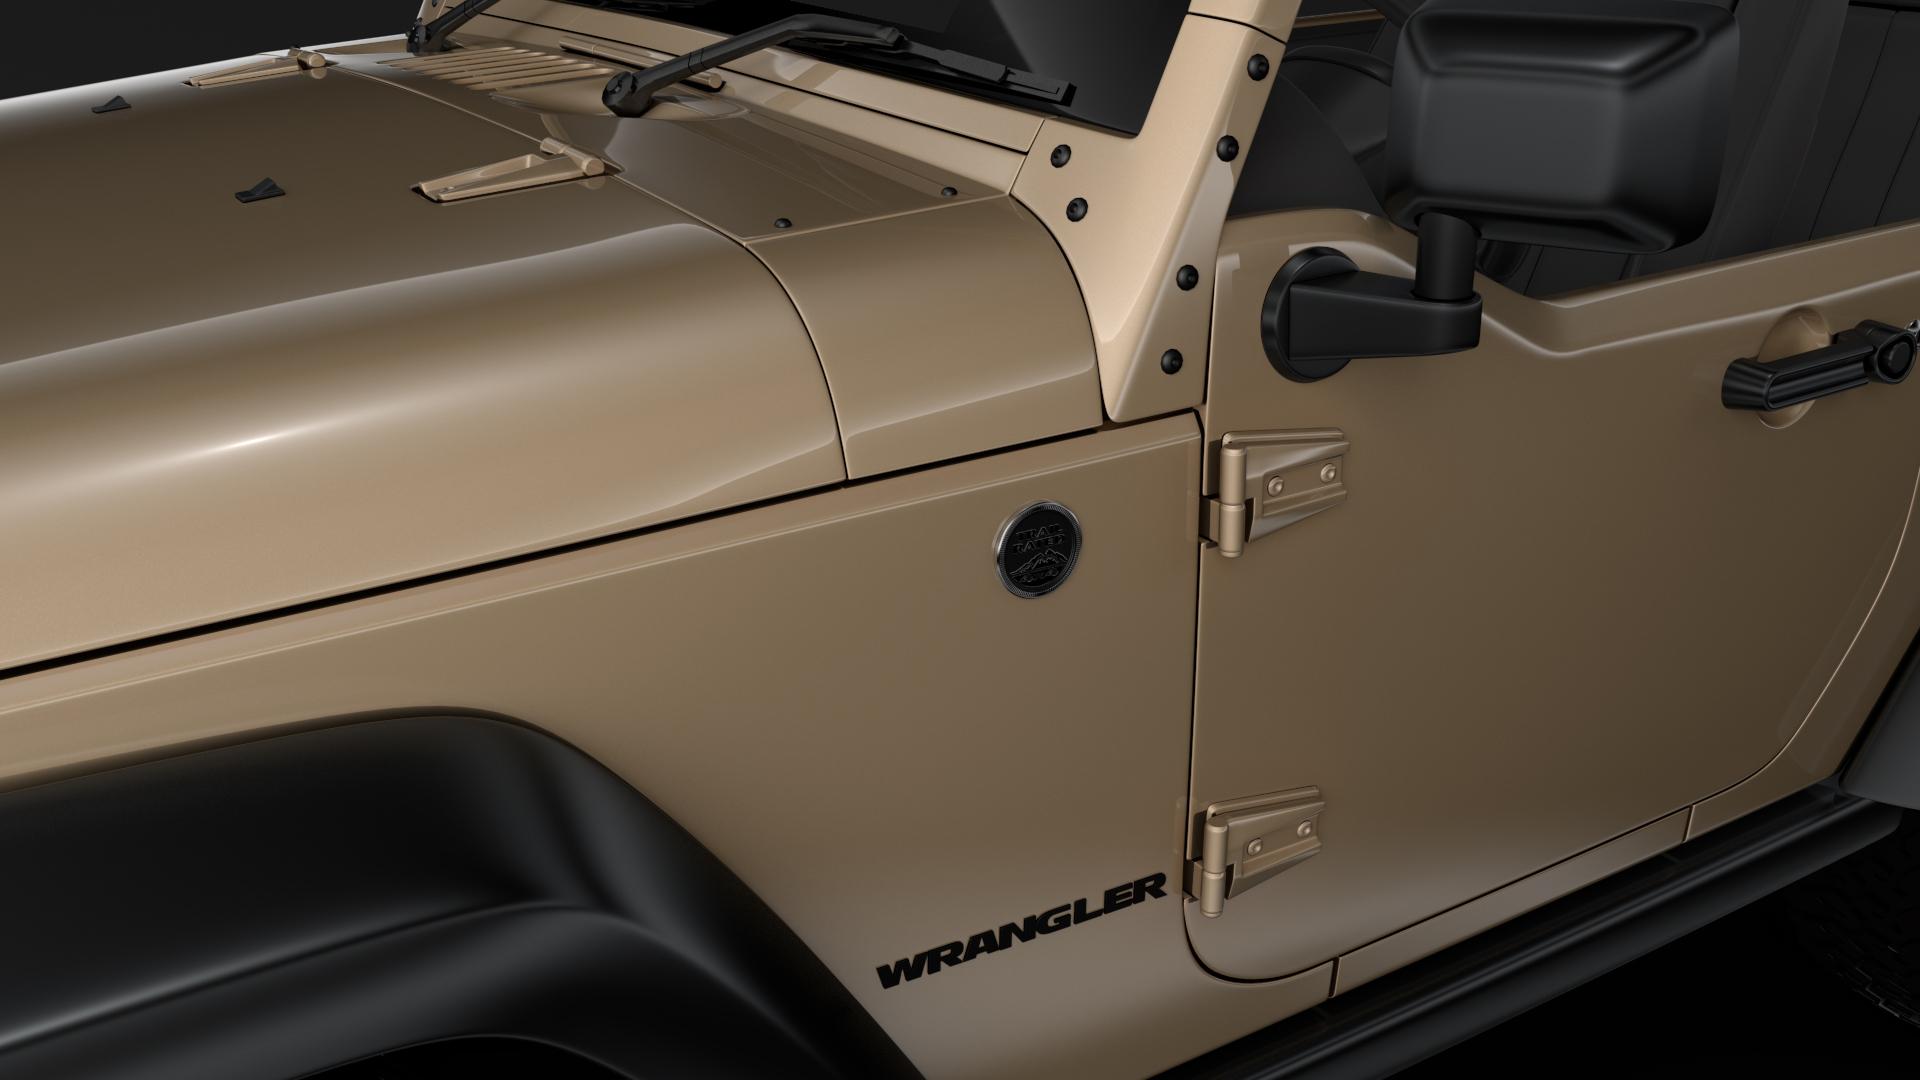 jeep wrangler willys wheeler jk 2017 3d model max fbx c4d lwo ma mb hrc xsi obj 276803